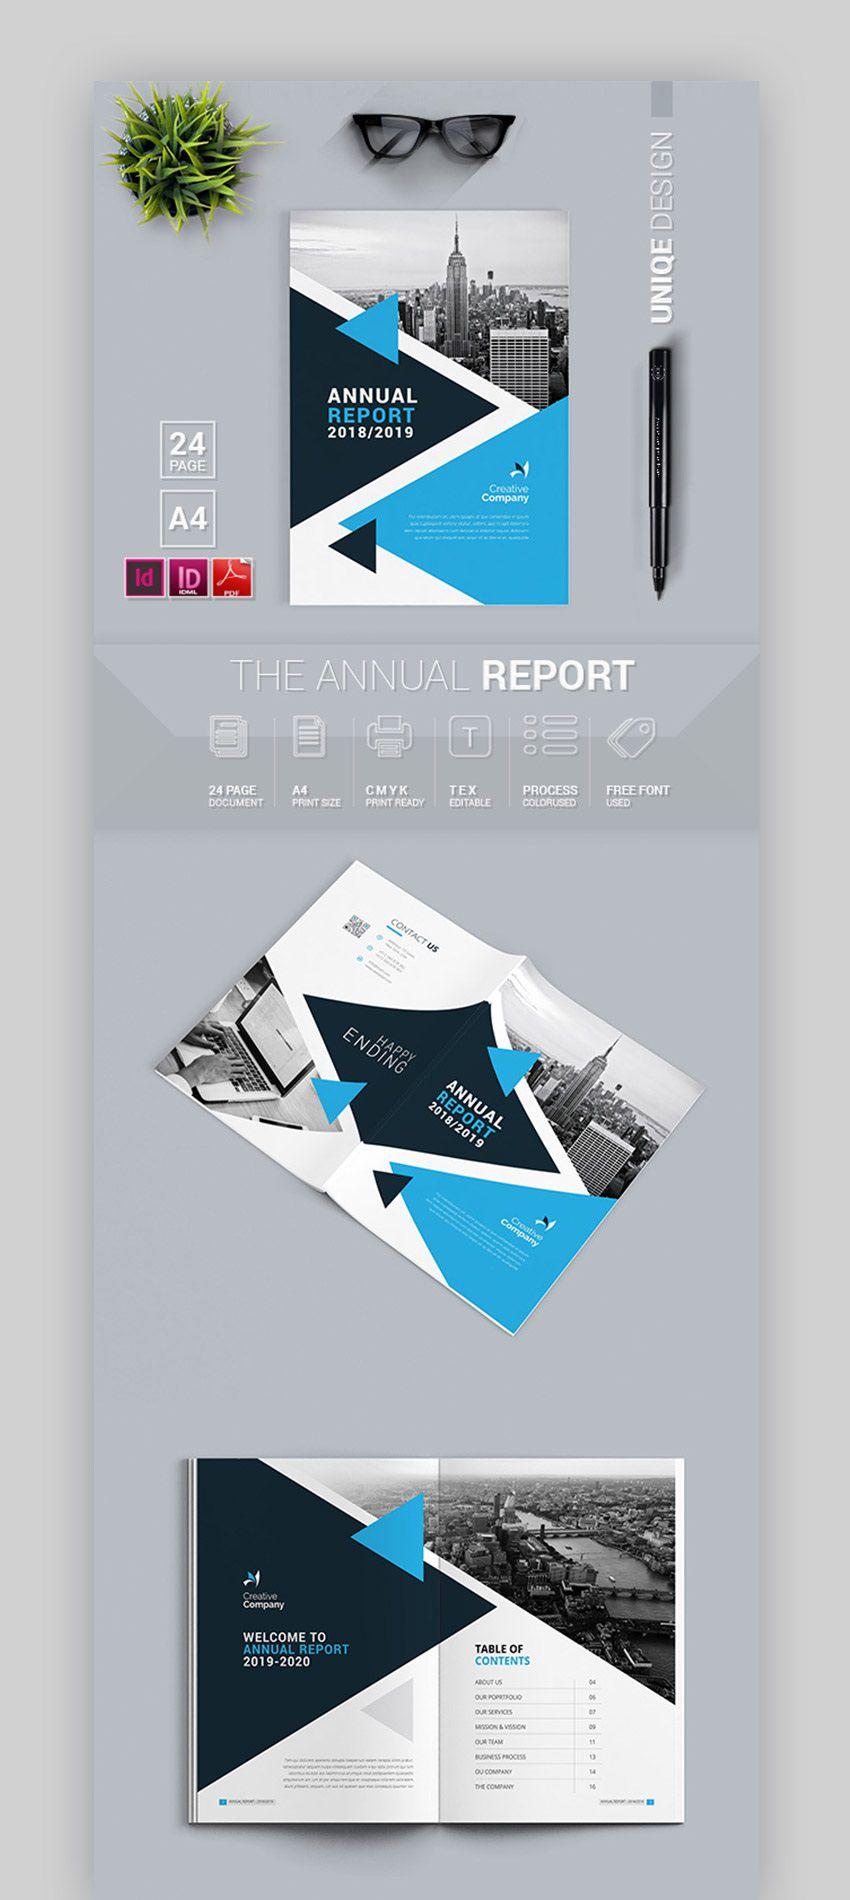 001 Fascinating Annual Report Design Template Indesign  Free DownloadFull